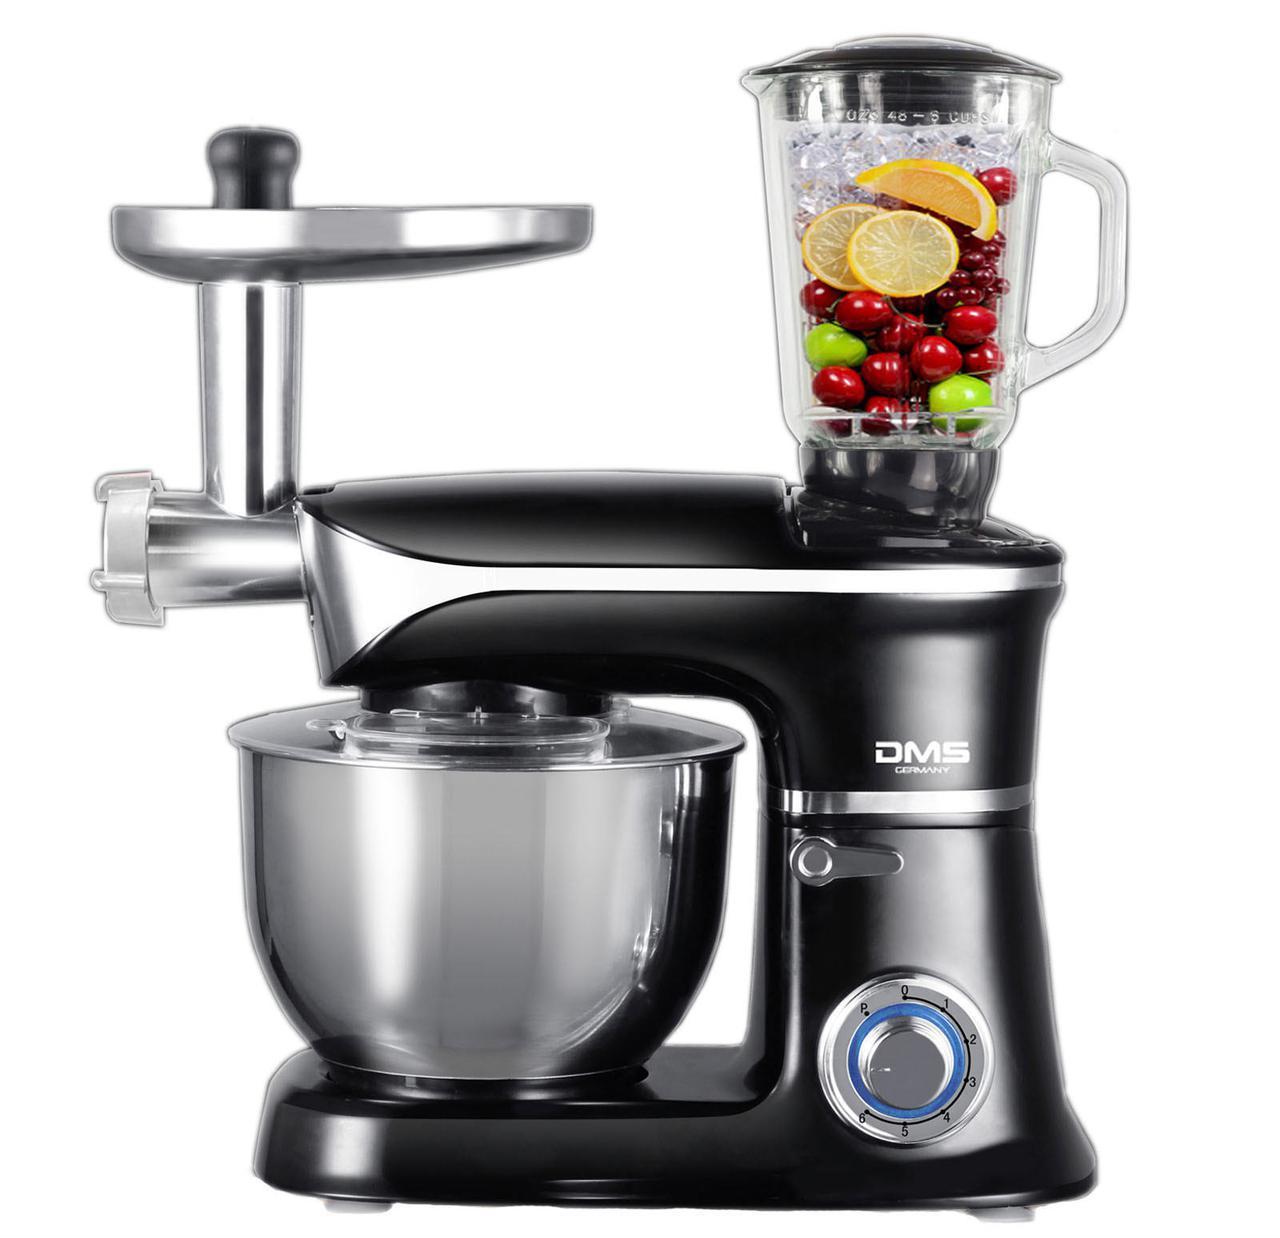 Кухонная машина DMS 1900w Black